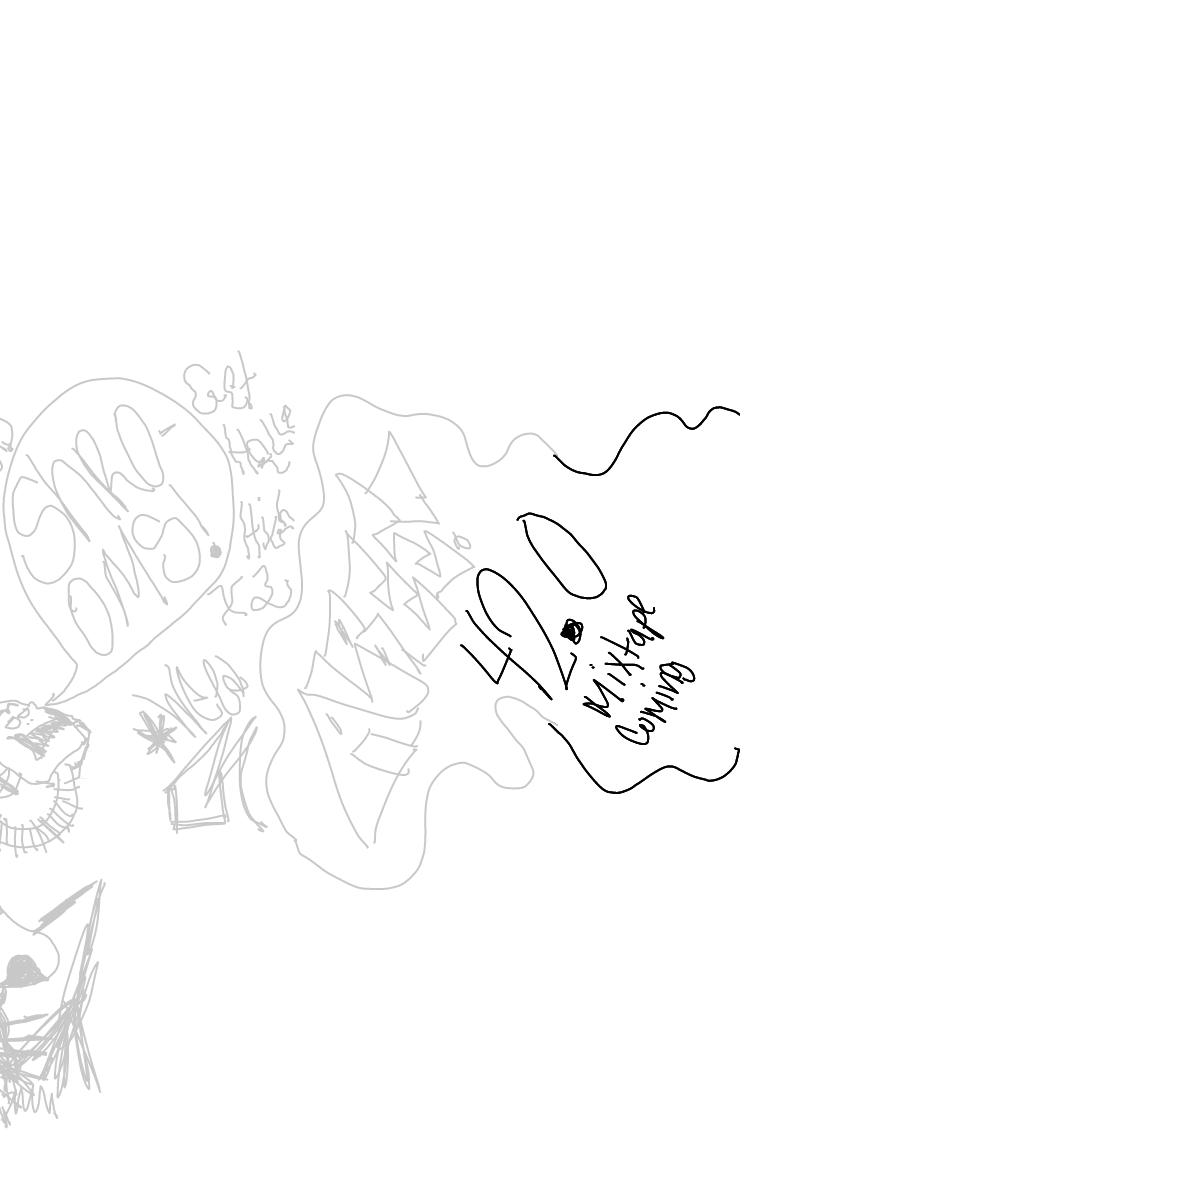 BAAAM drawing#13423 lat:38.1951828002929700lng: -85.5861053466796900